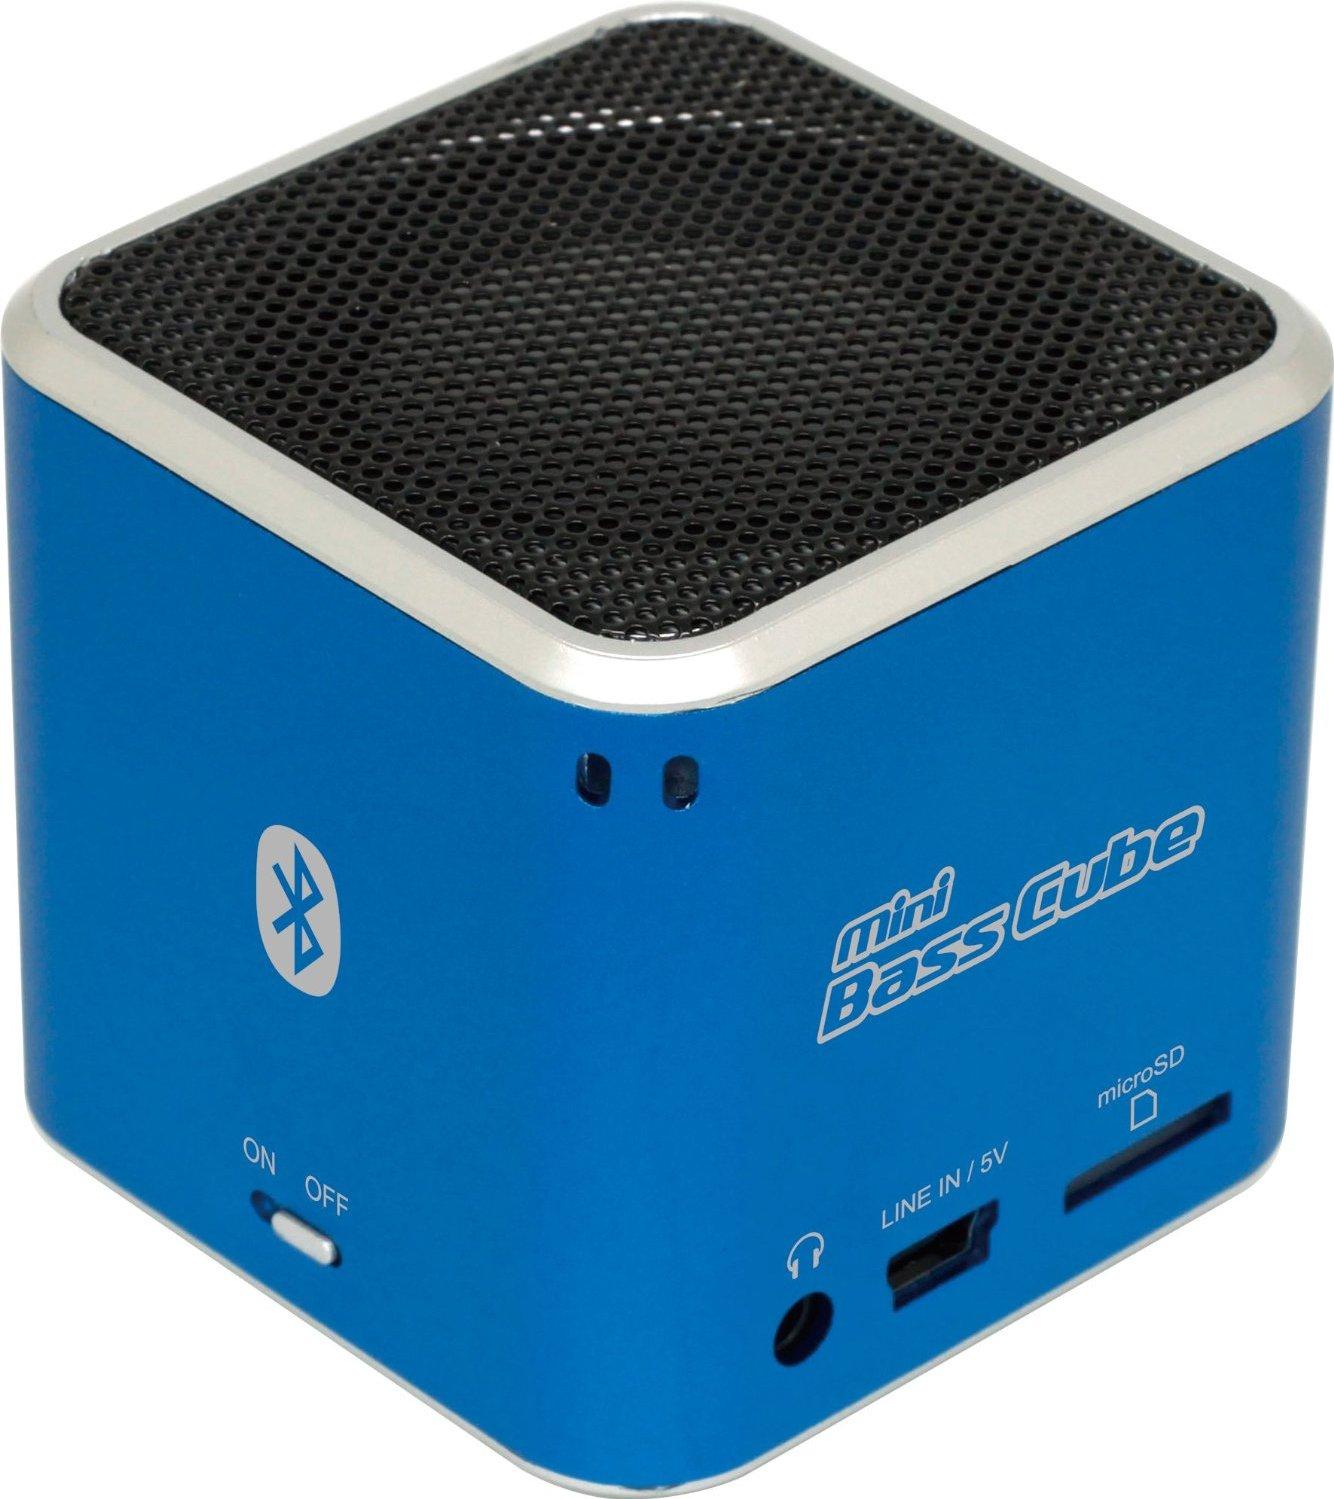 "[Kaufland Wetzlar] Jay-tech ""mini Bass Cube"" Bluetooth Lautsprecher für 5,99€"